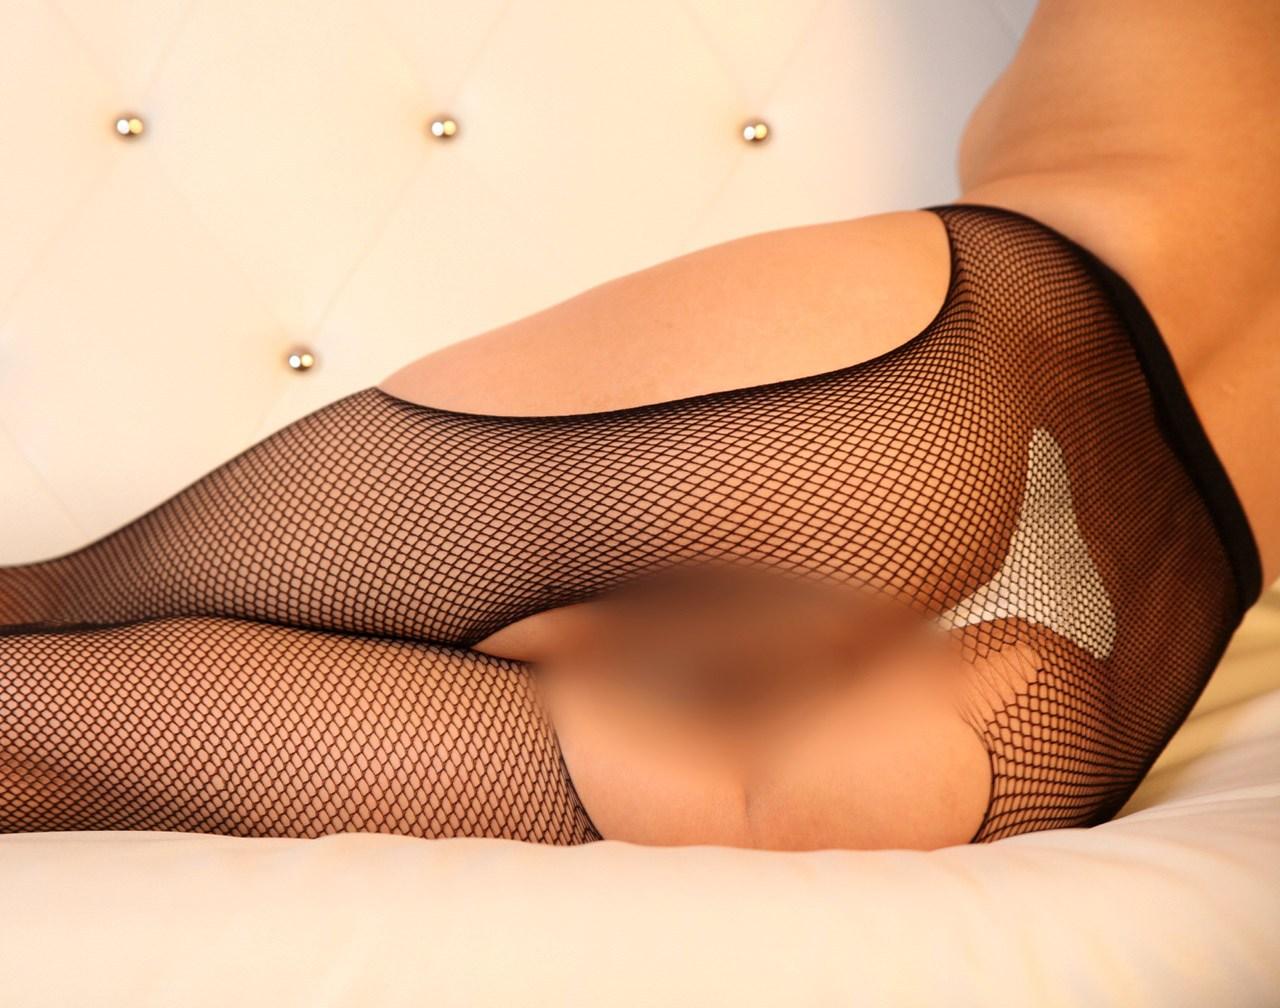 xaccplaknrklaesap0appl 011 - Korean Nude - Big Albom Remain #A-korean girl